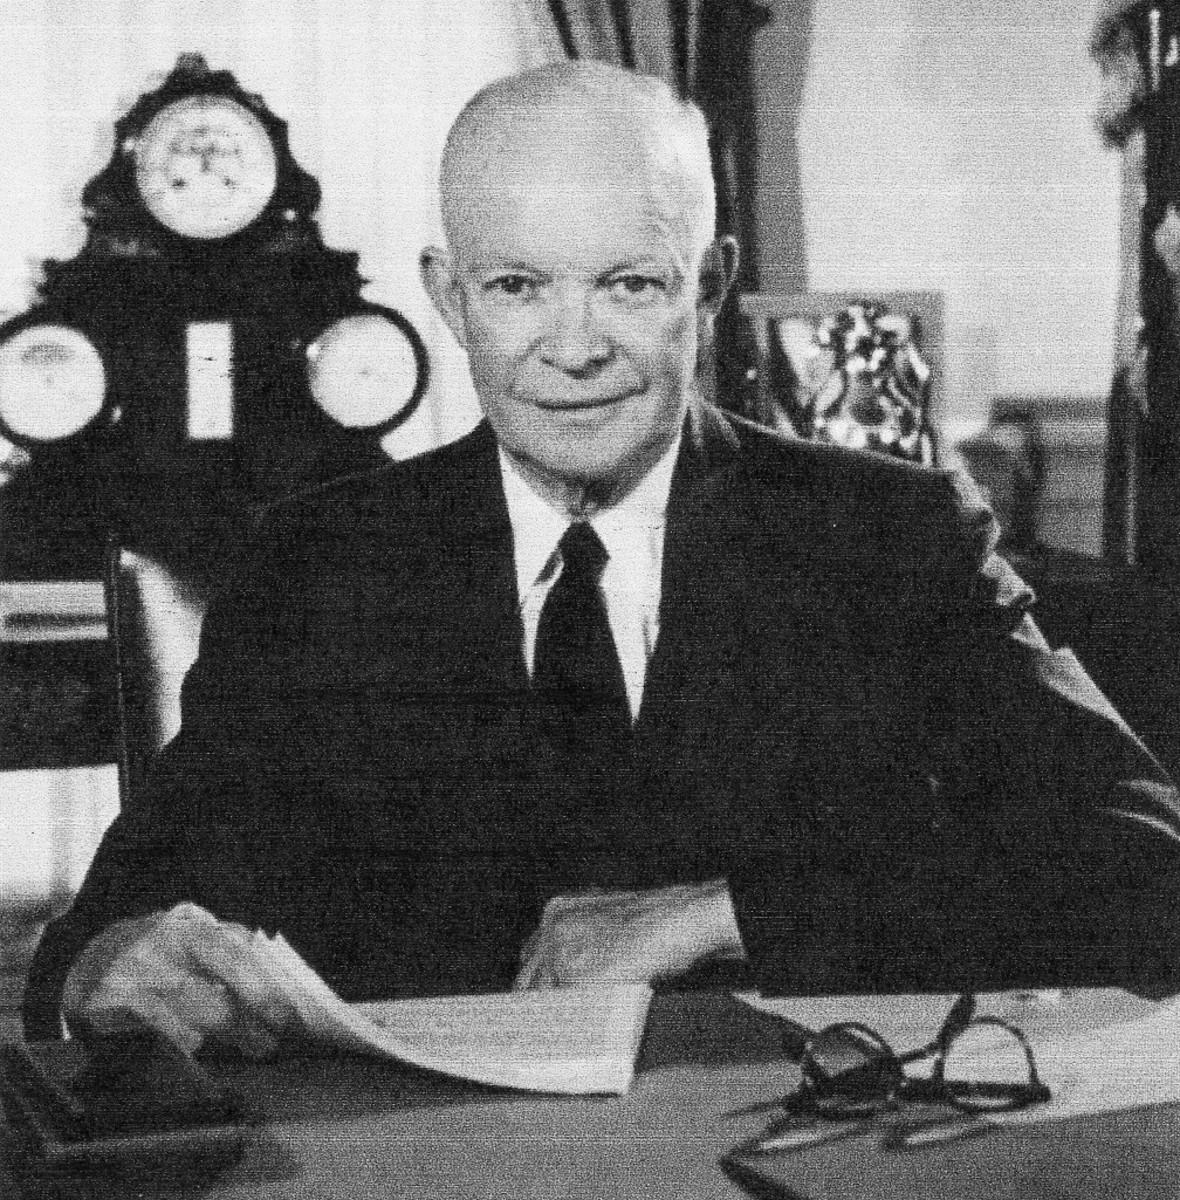 Dwight D. Eisenhower, the thirty-fourth president, 1953-1961